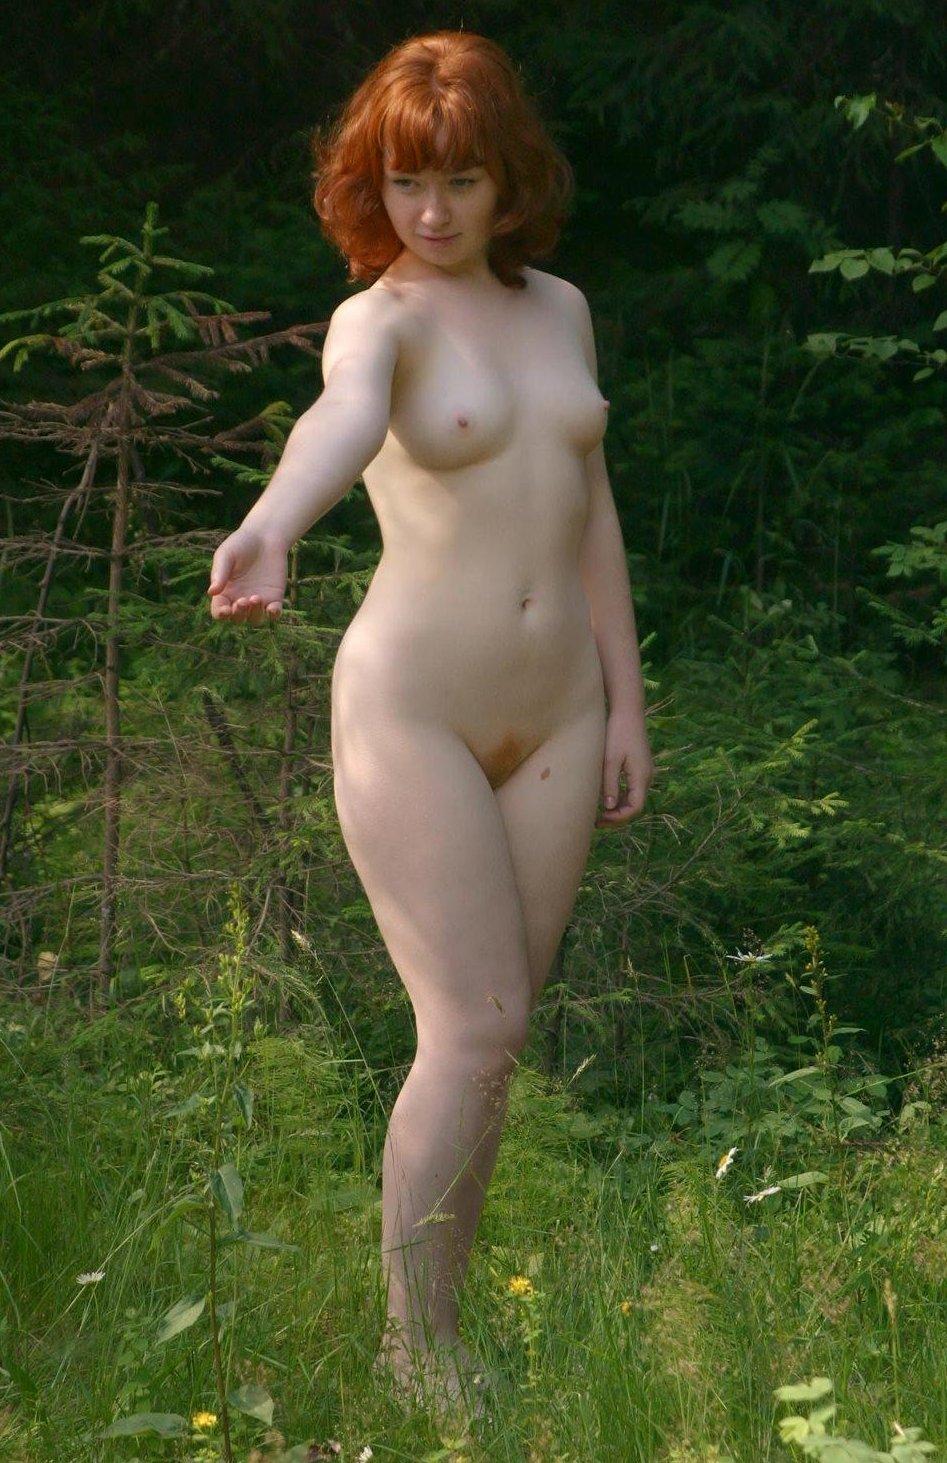 redhead-amateur-outdoors-kristin-ferry-bra